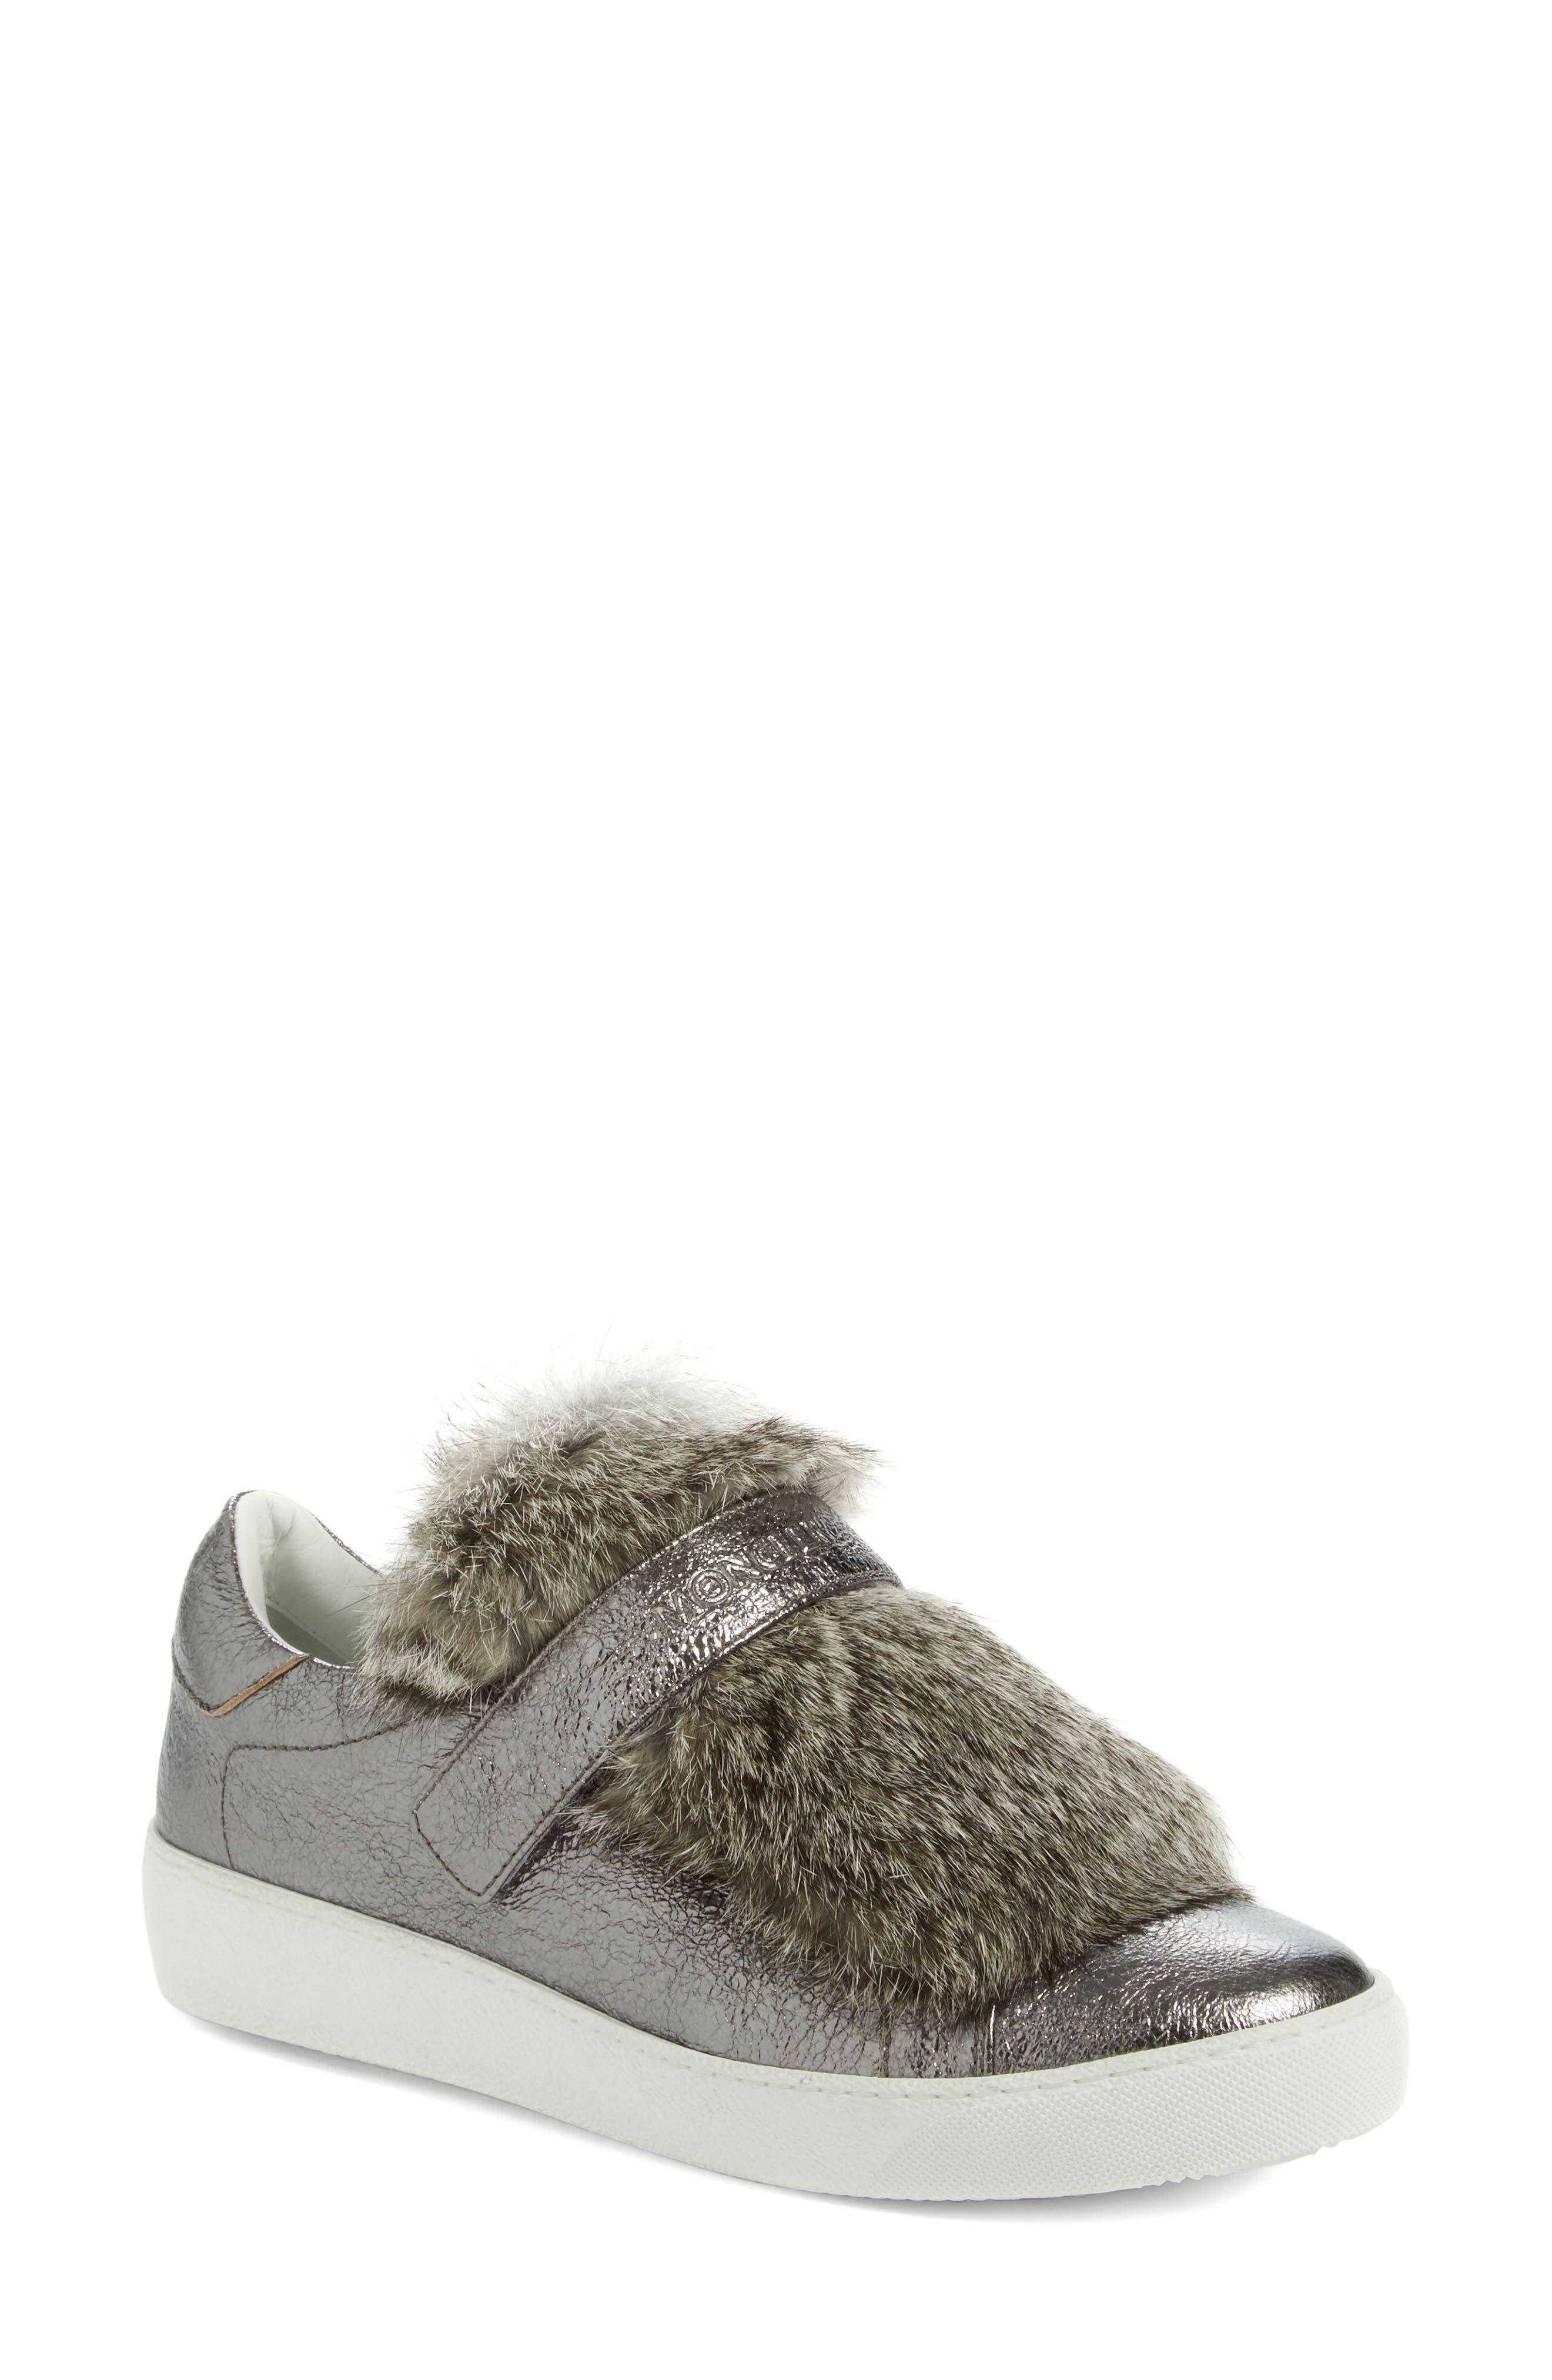 MONCLER, 'Lucie Scarpa' Genuine Rabbit Fur Trim Sneaker, Alternate thumbnail 5, color, 020